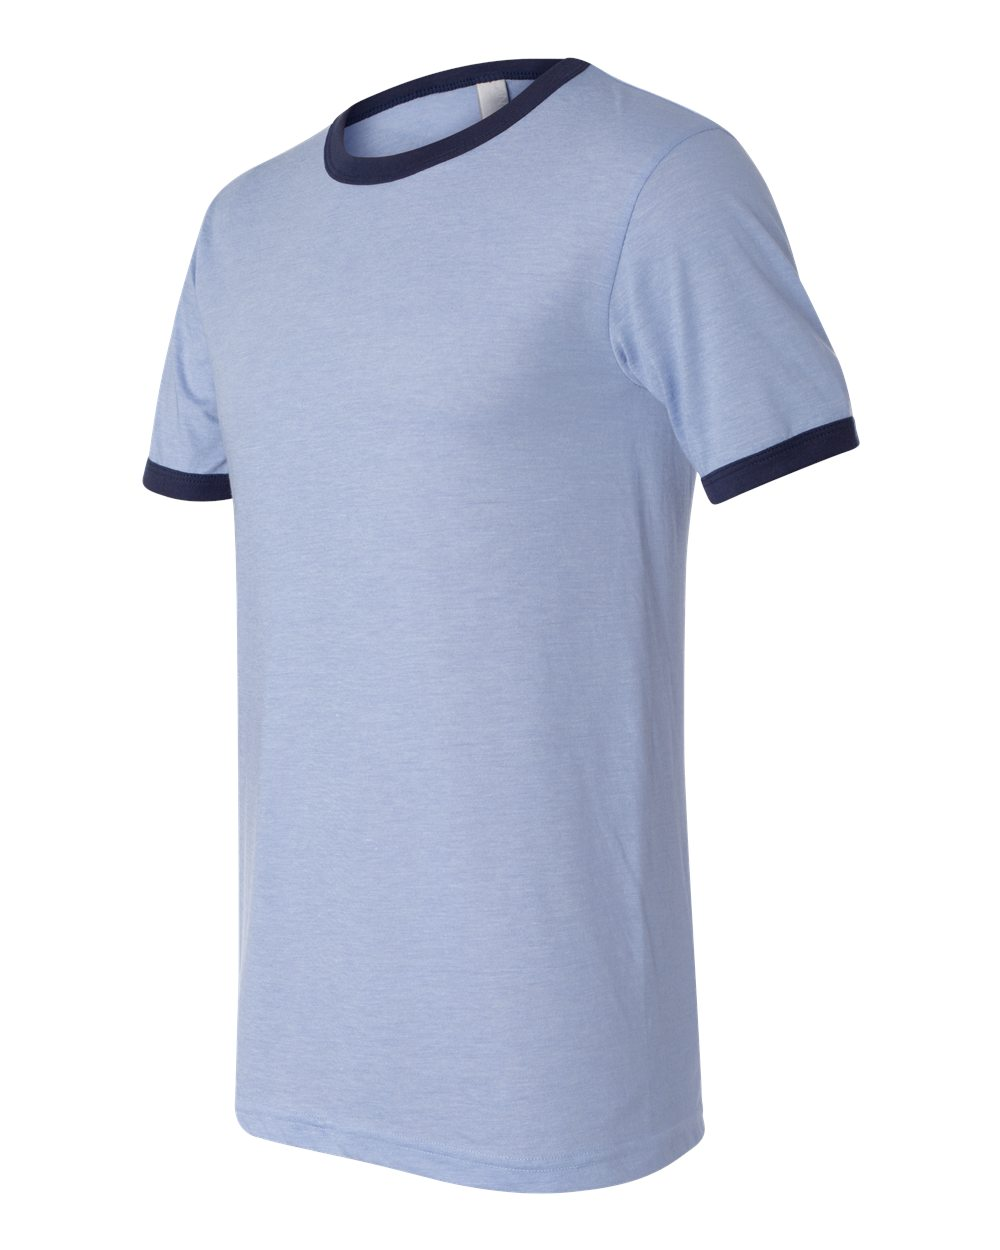 Canvas Men/'s Jersey Short-Sleeve Ringer T-Shirt-3055C Bella